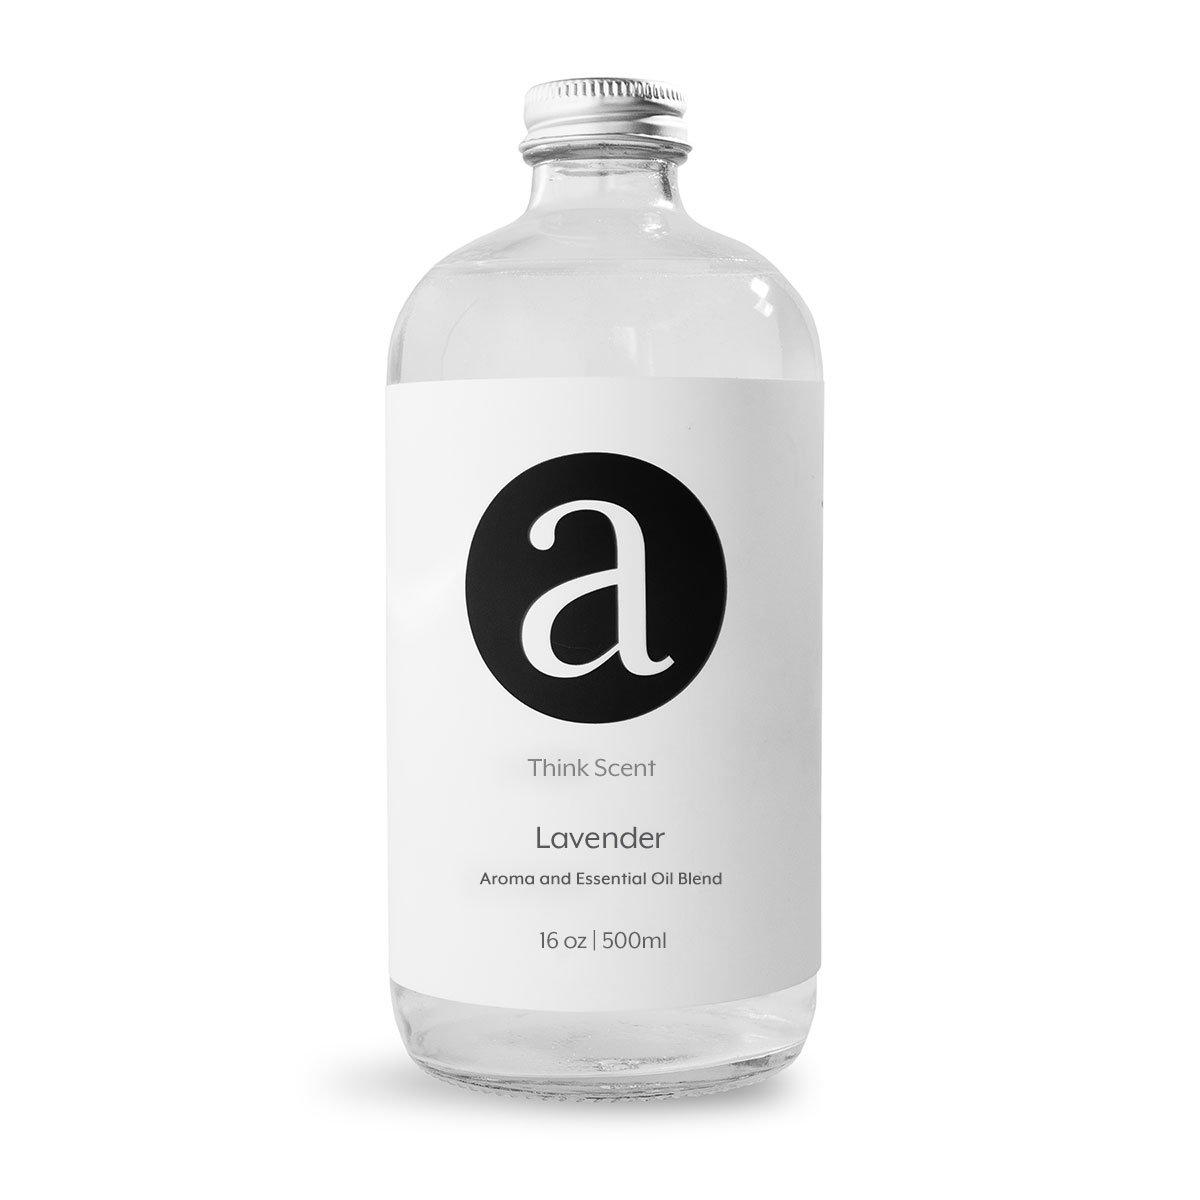 (Lavender) Aroma / Fragrance Oil For AromaTech Air Freshener Scent Diffuser (Half Gallon)